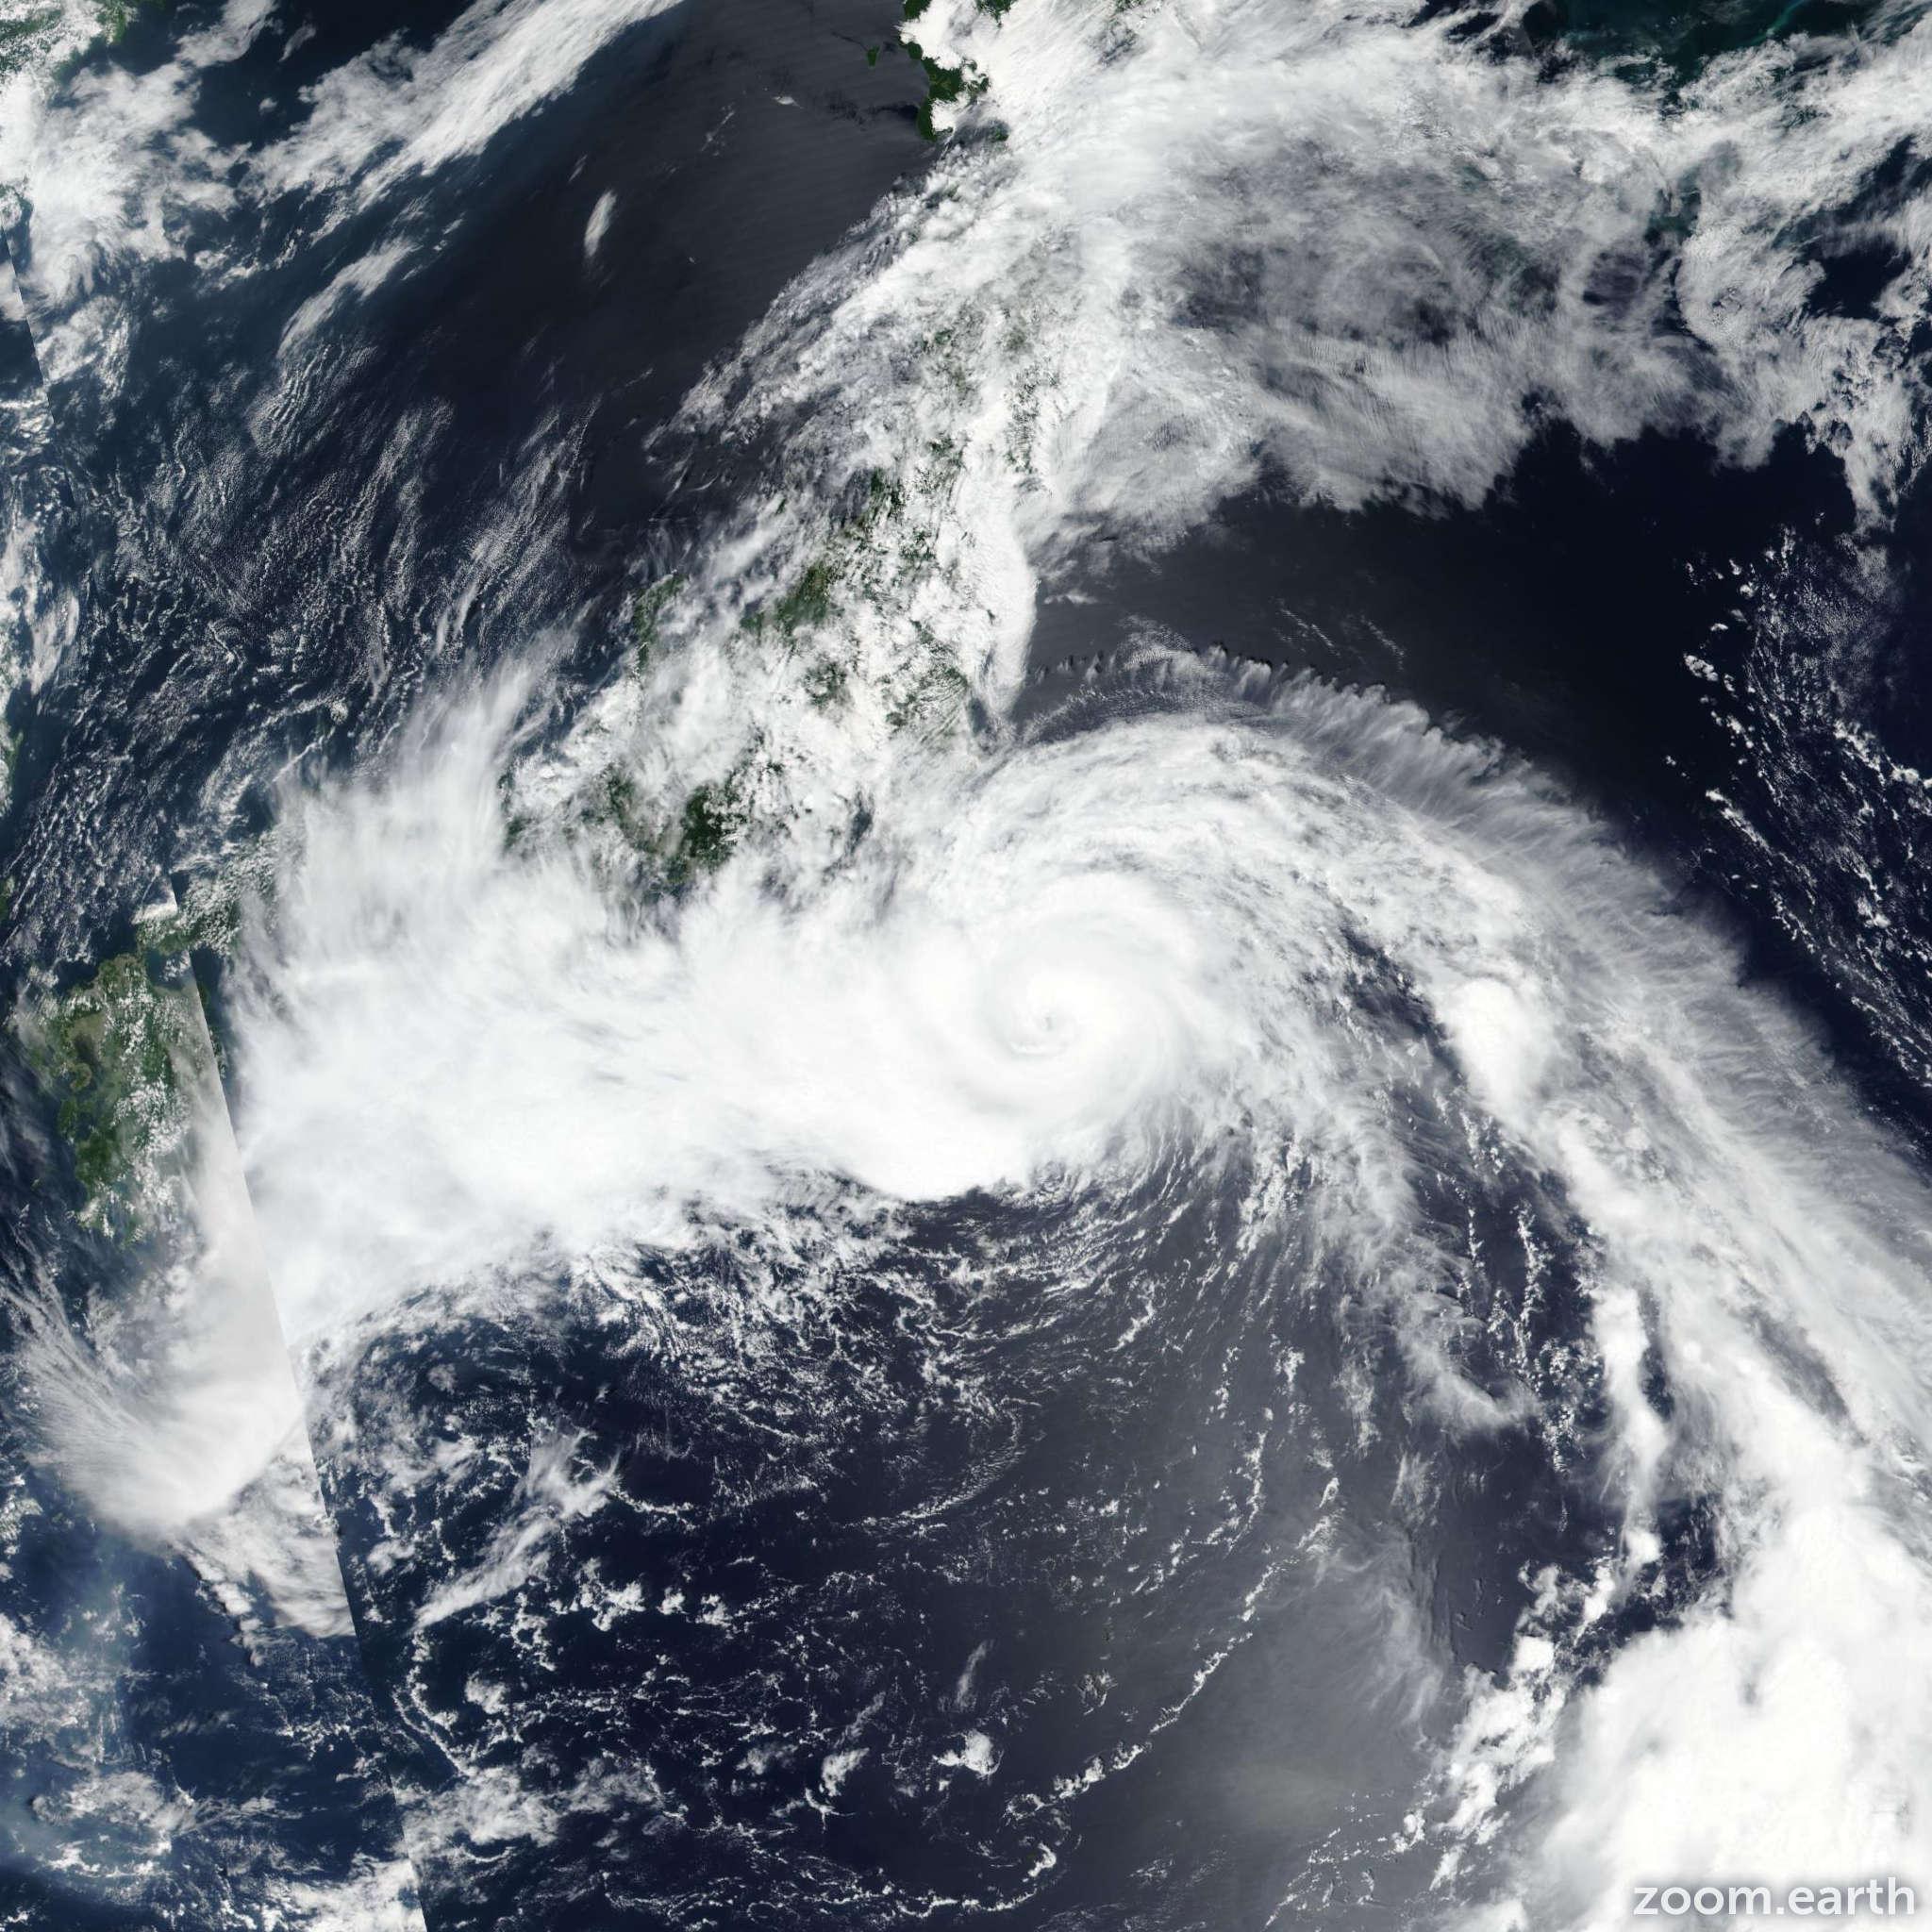 Satellite image of Typhoon Jongdari 2018